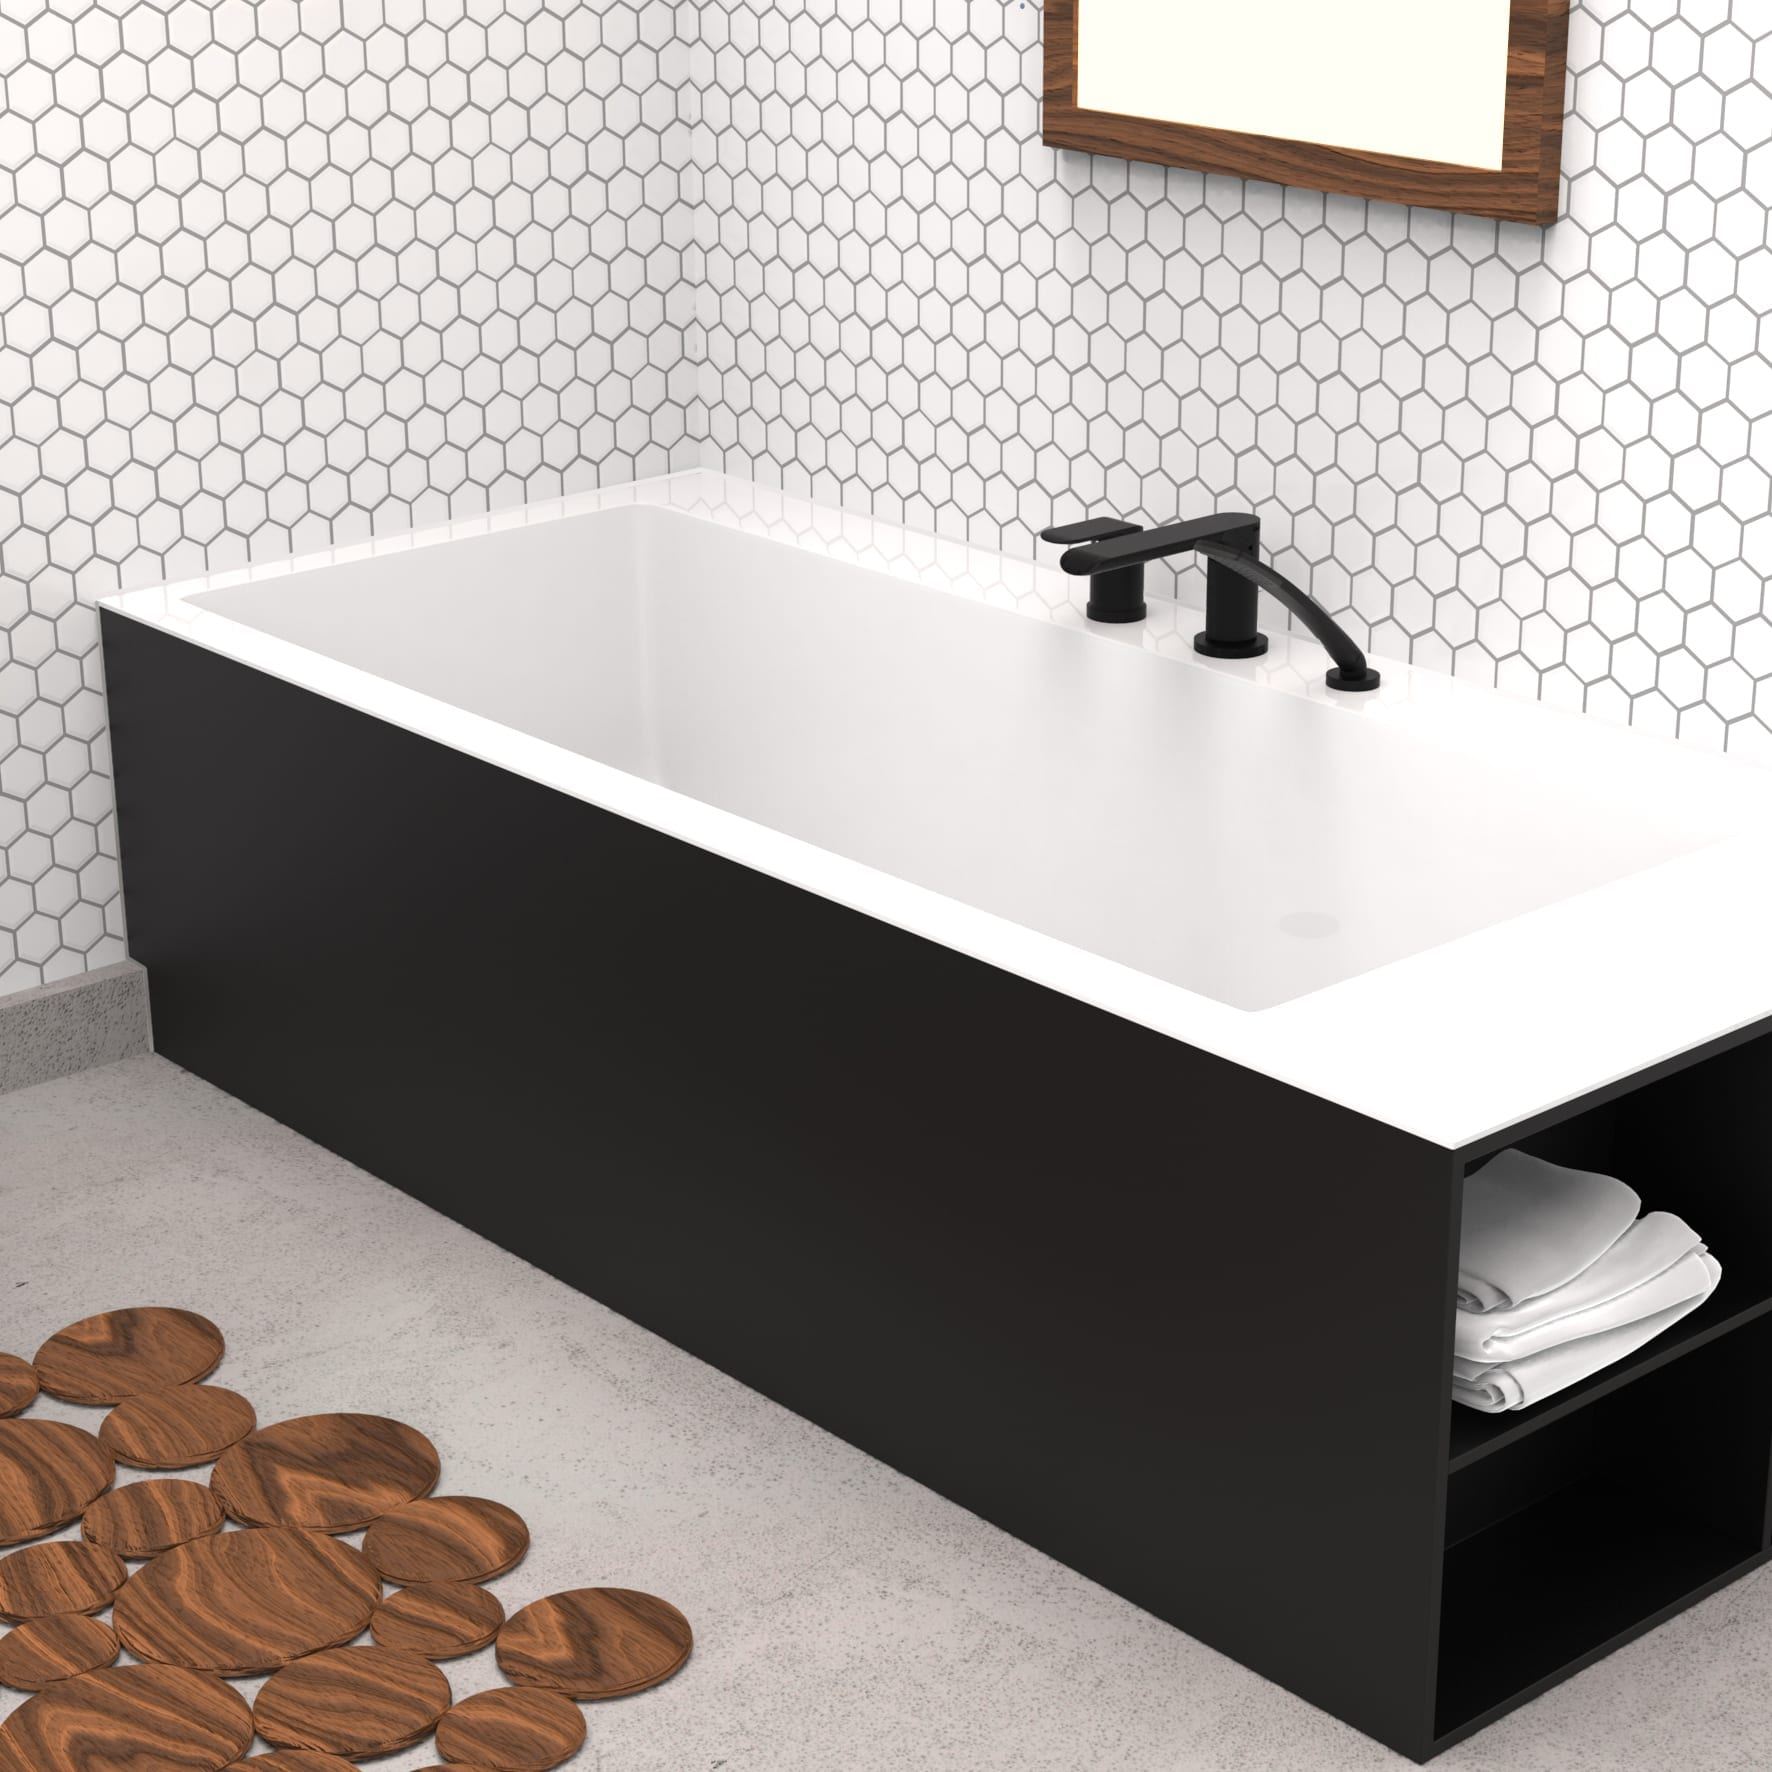 Matte Black Bathtub Faucet Trim For Roman Bathtub Hand